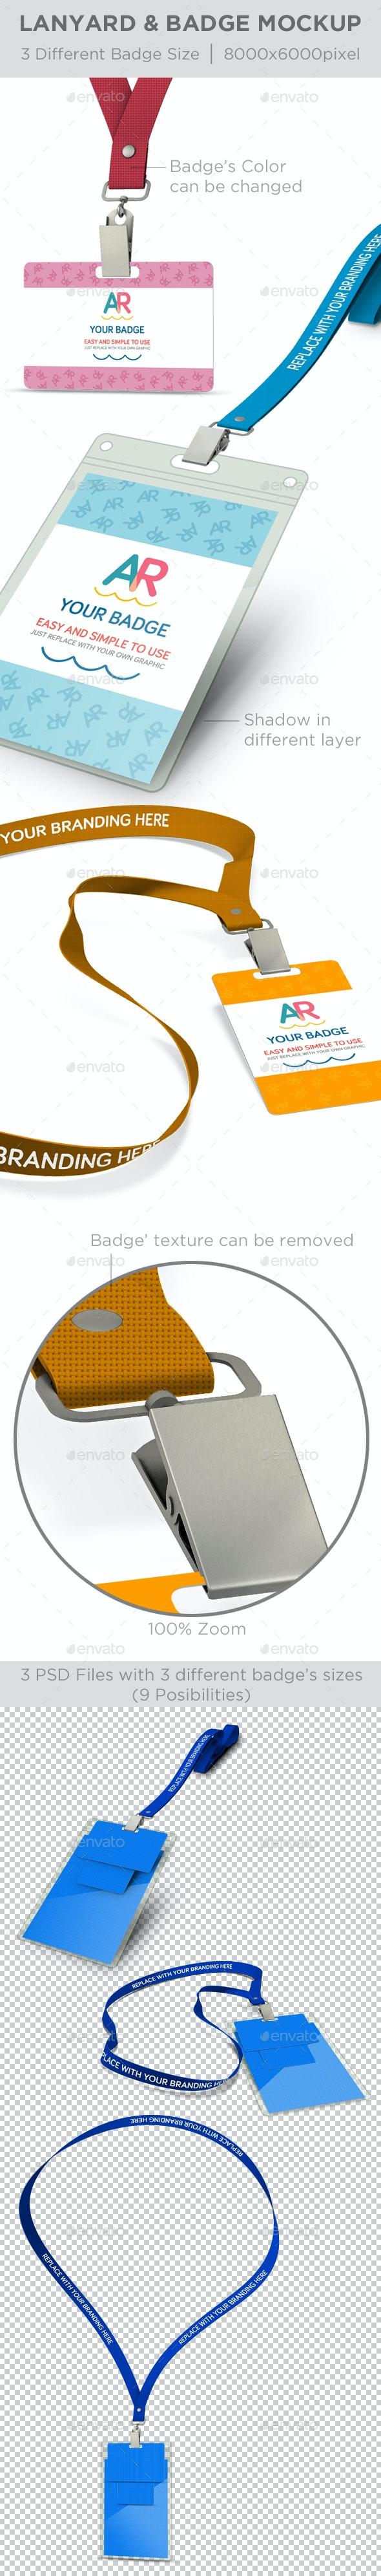 Lanyard & Badge Mockup - Product Mock-Ups Graphics